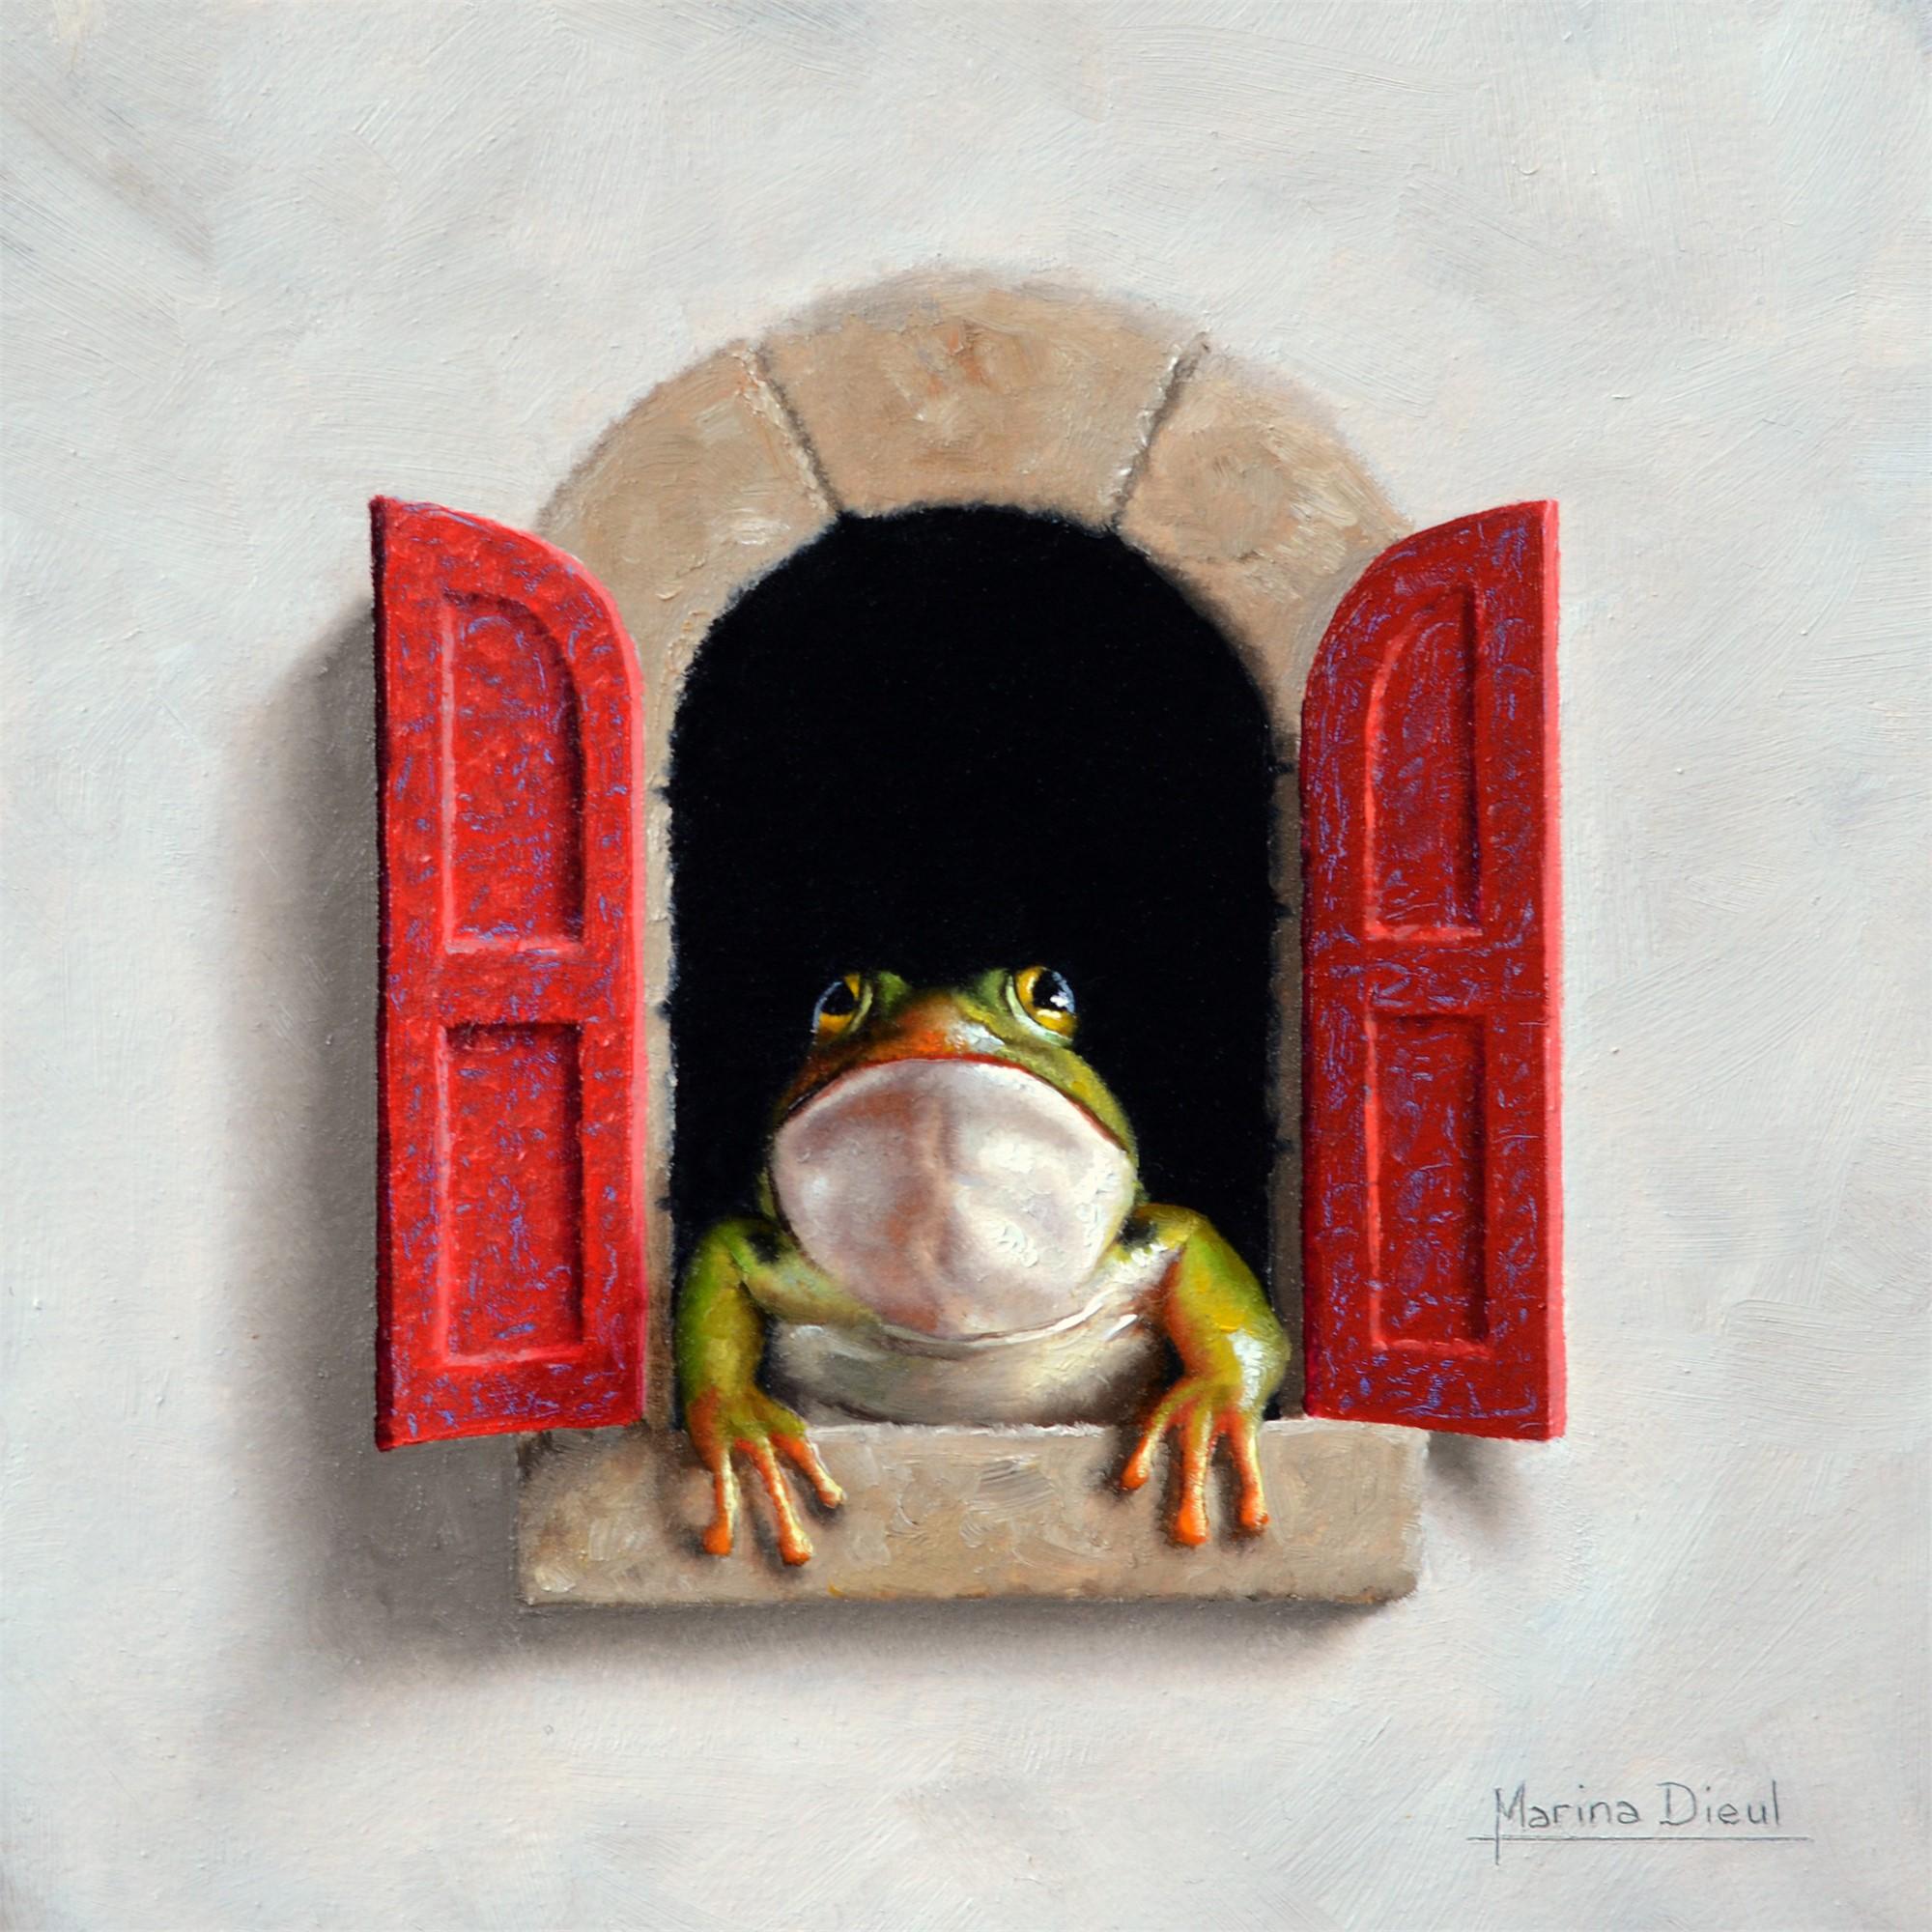 Grenouille a le Fenetre by Marina Dieul